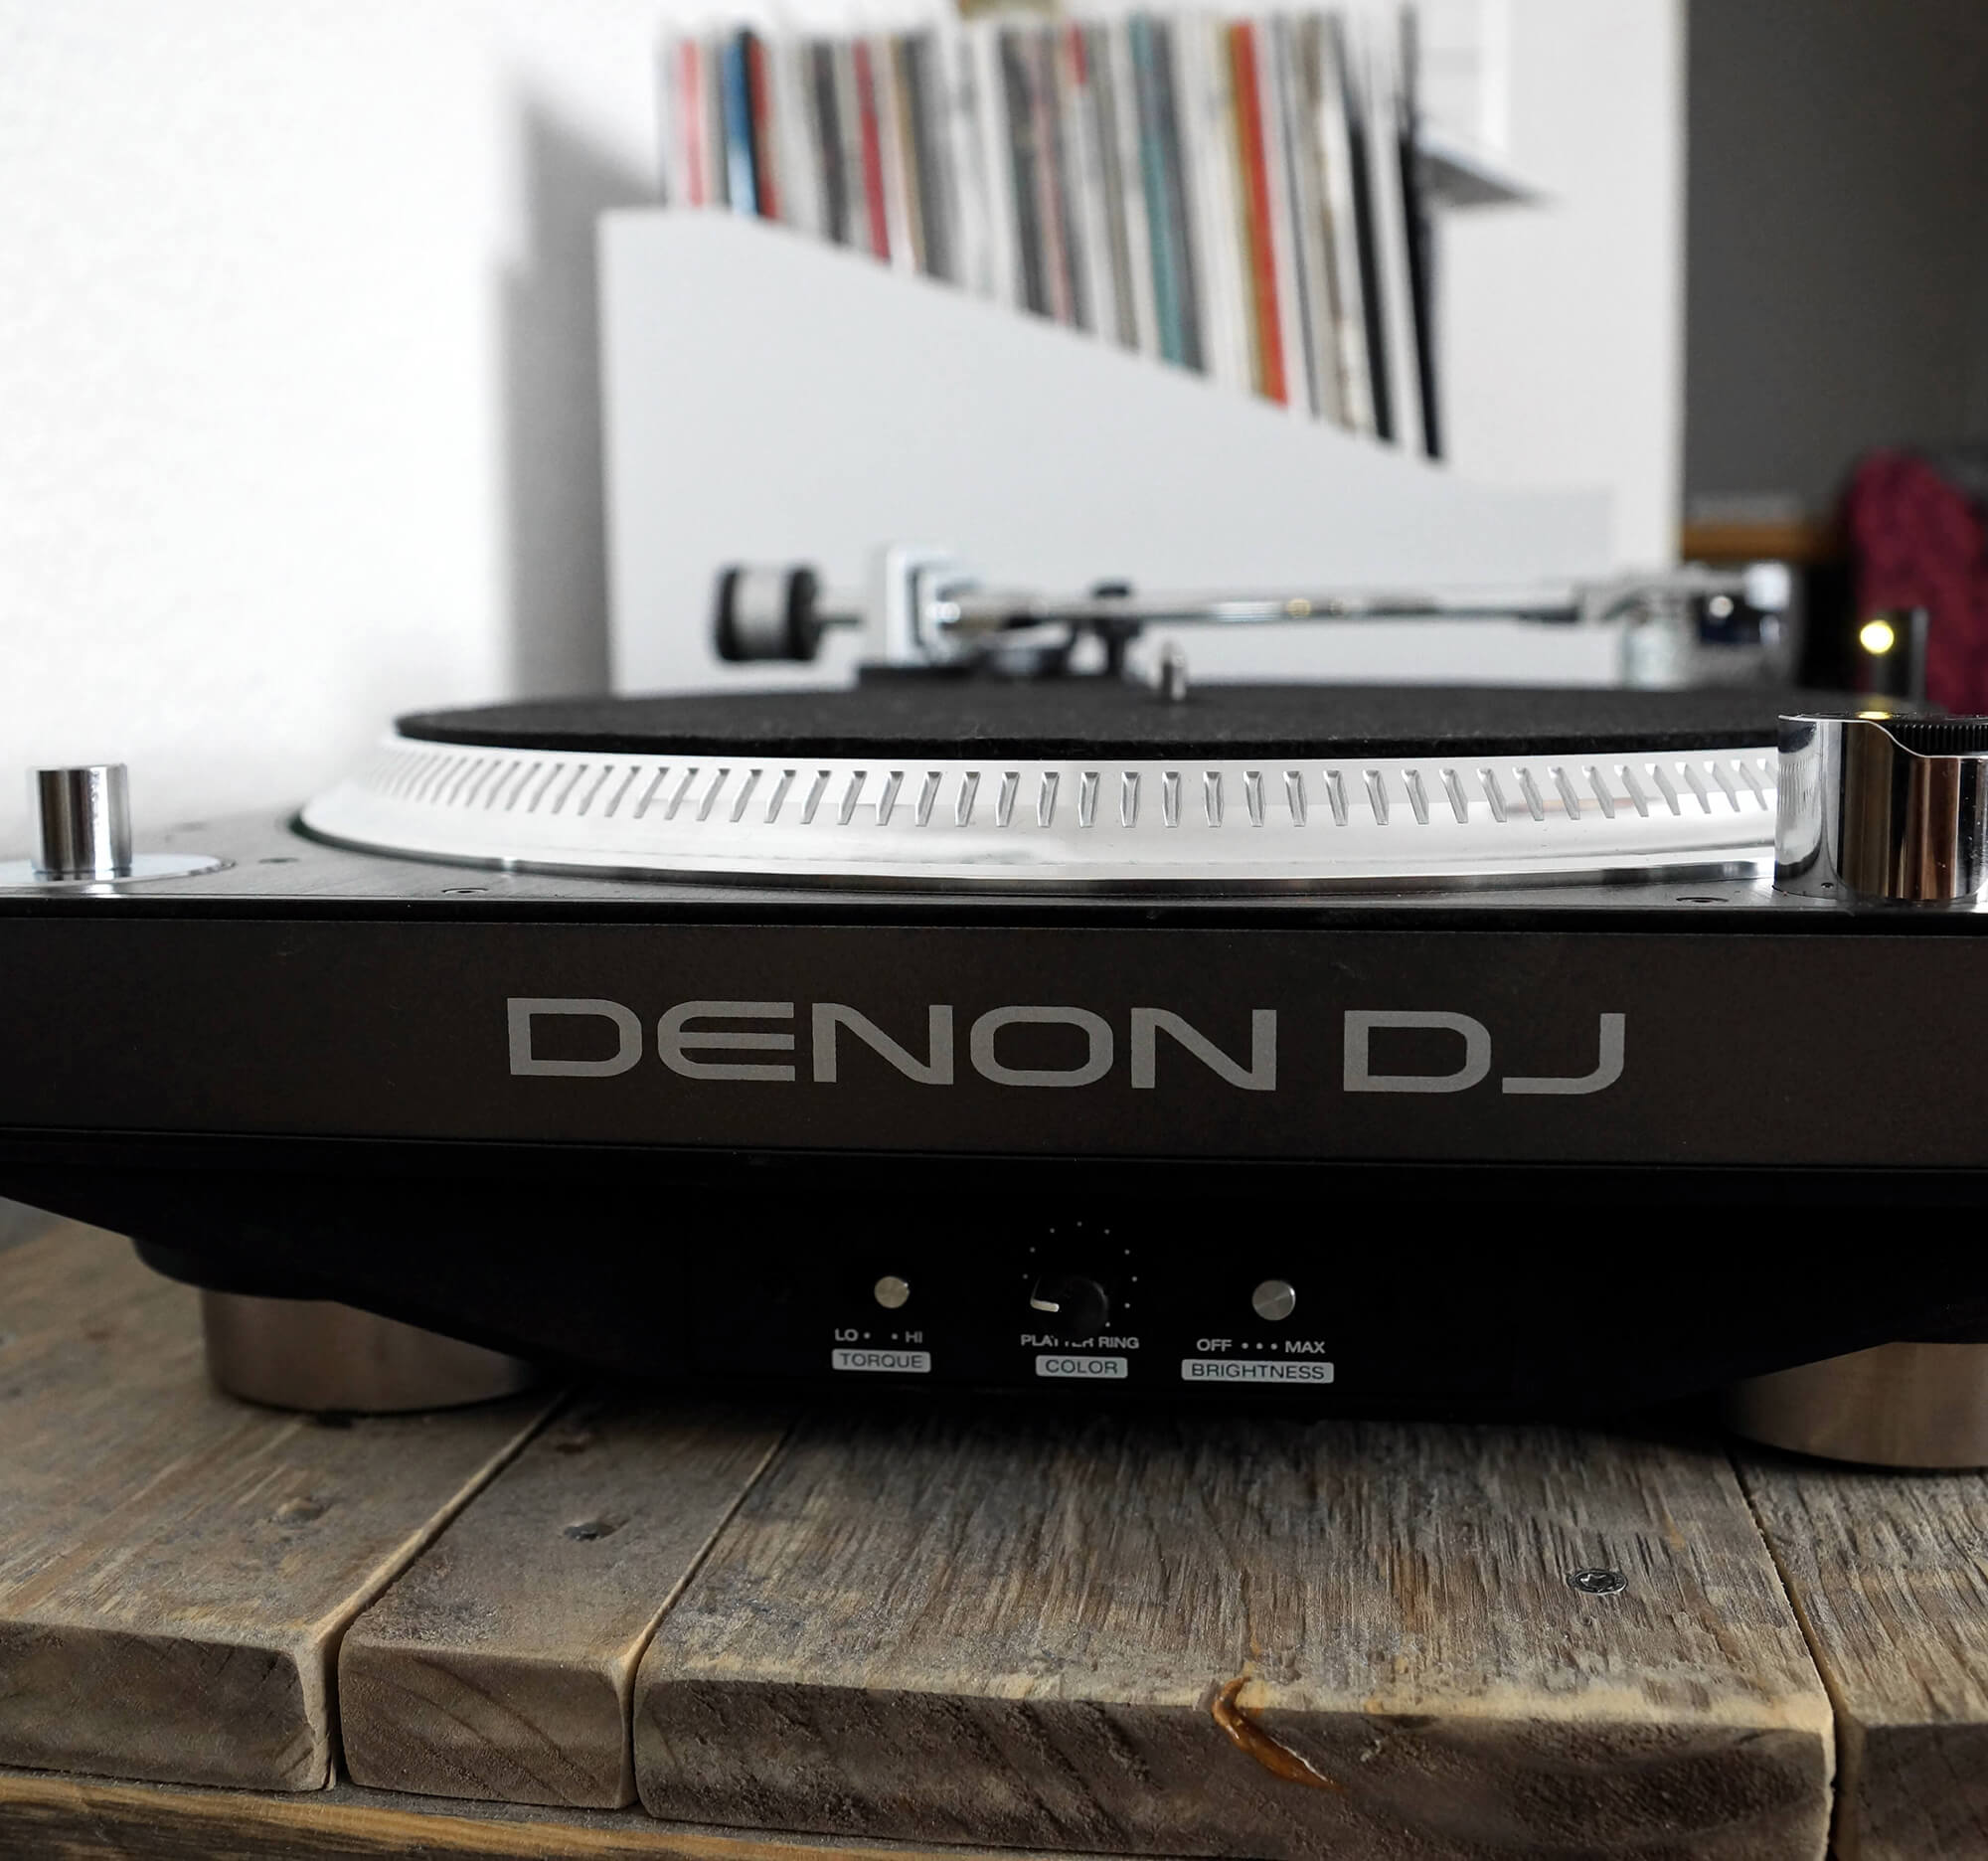 Sonos Vinyl: Denon DJ VL12 Prime Test 16 techboys.de • smarte News, auf den Punkt! Sonos Vinyl: Denon DJ VL12 Prime Test